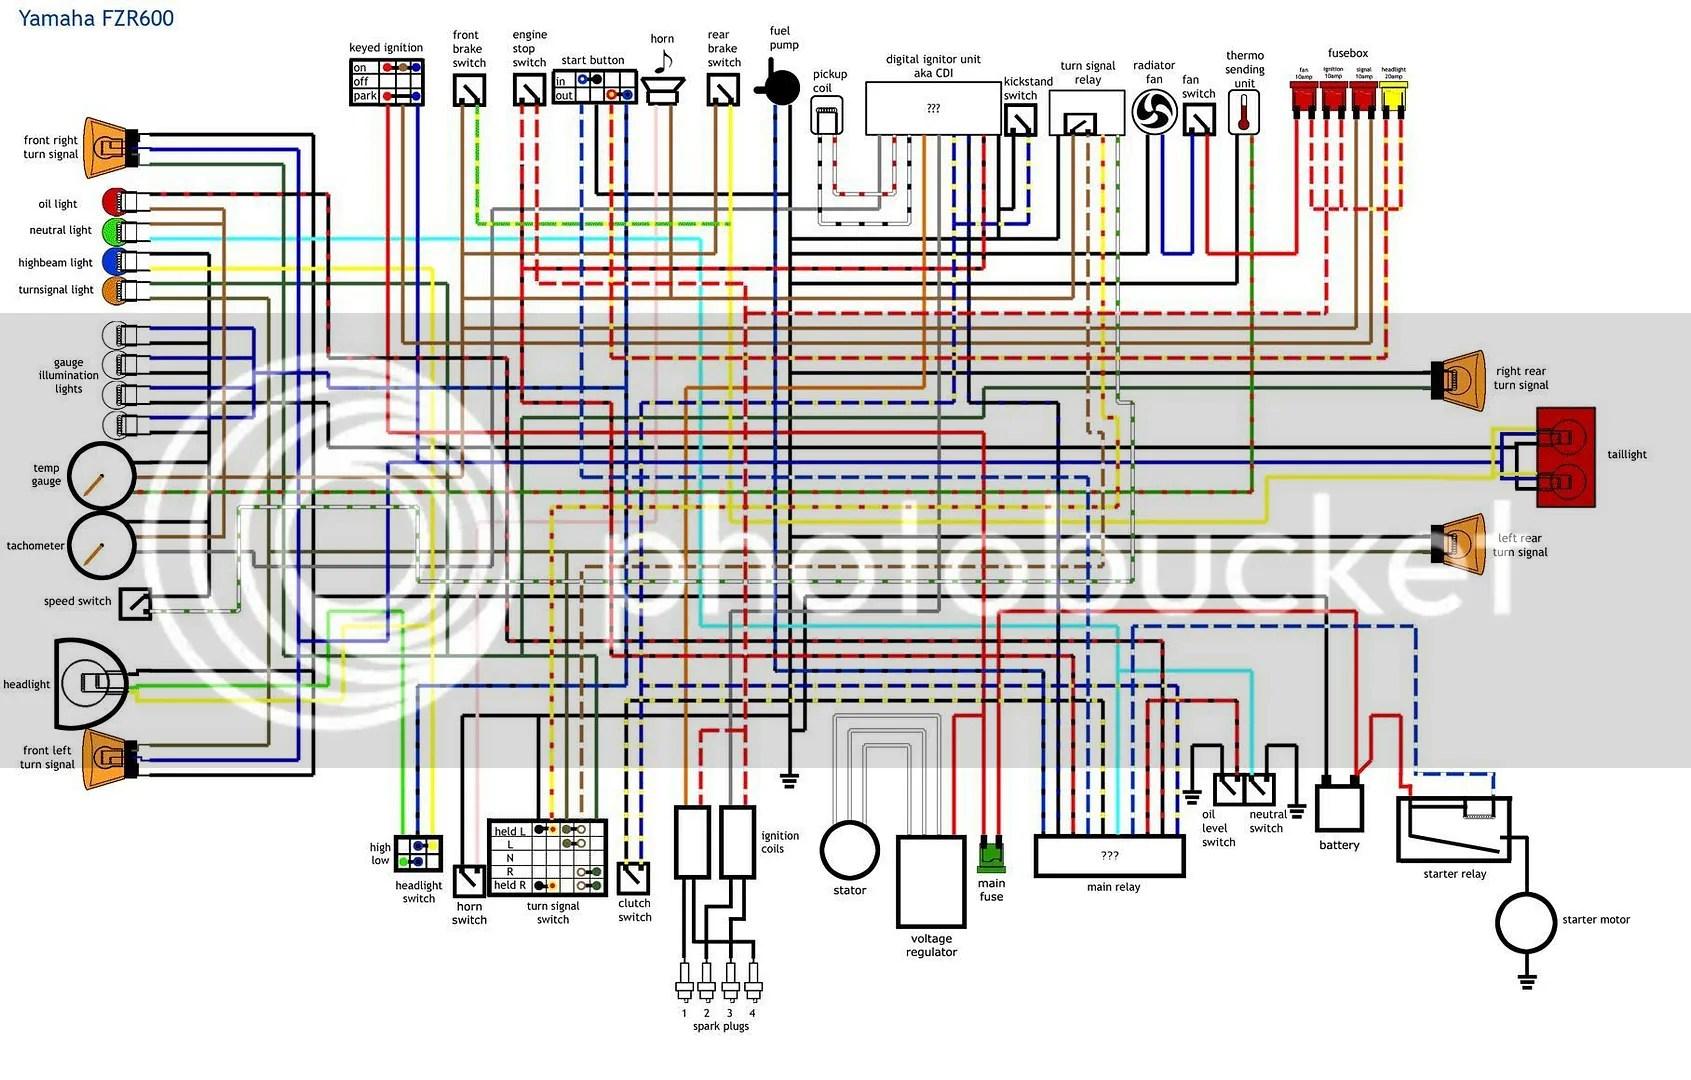 1989 Fzr 1000 Wiring Diagram | Wiring Diagram Yamaha Fzr Wiring Diagram on